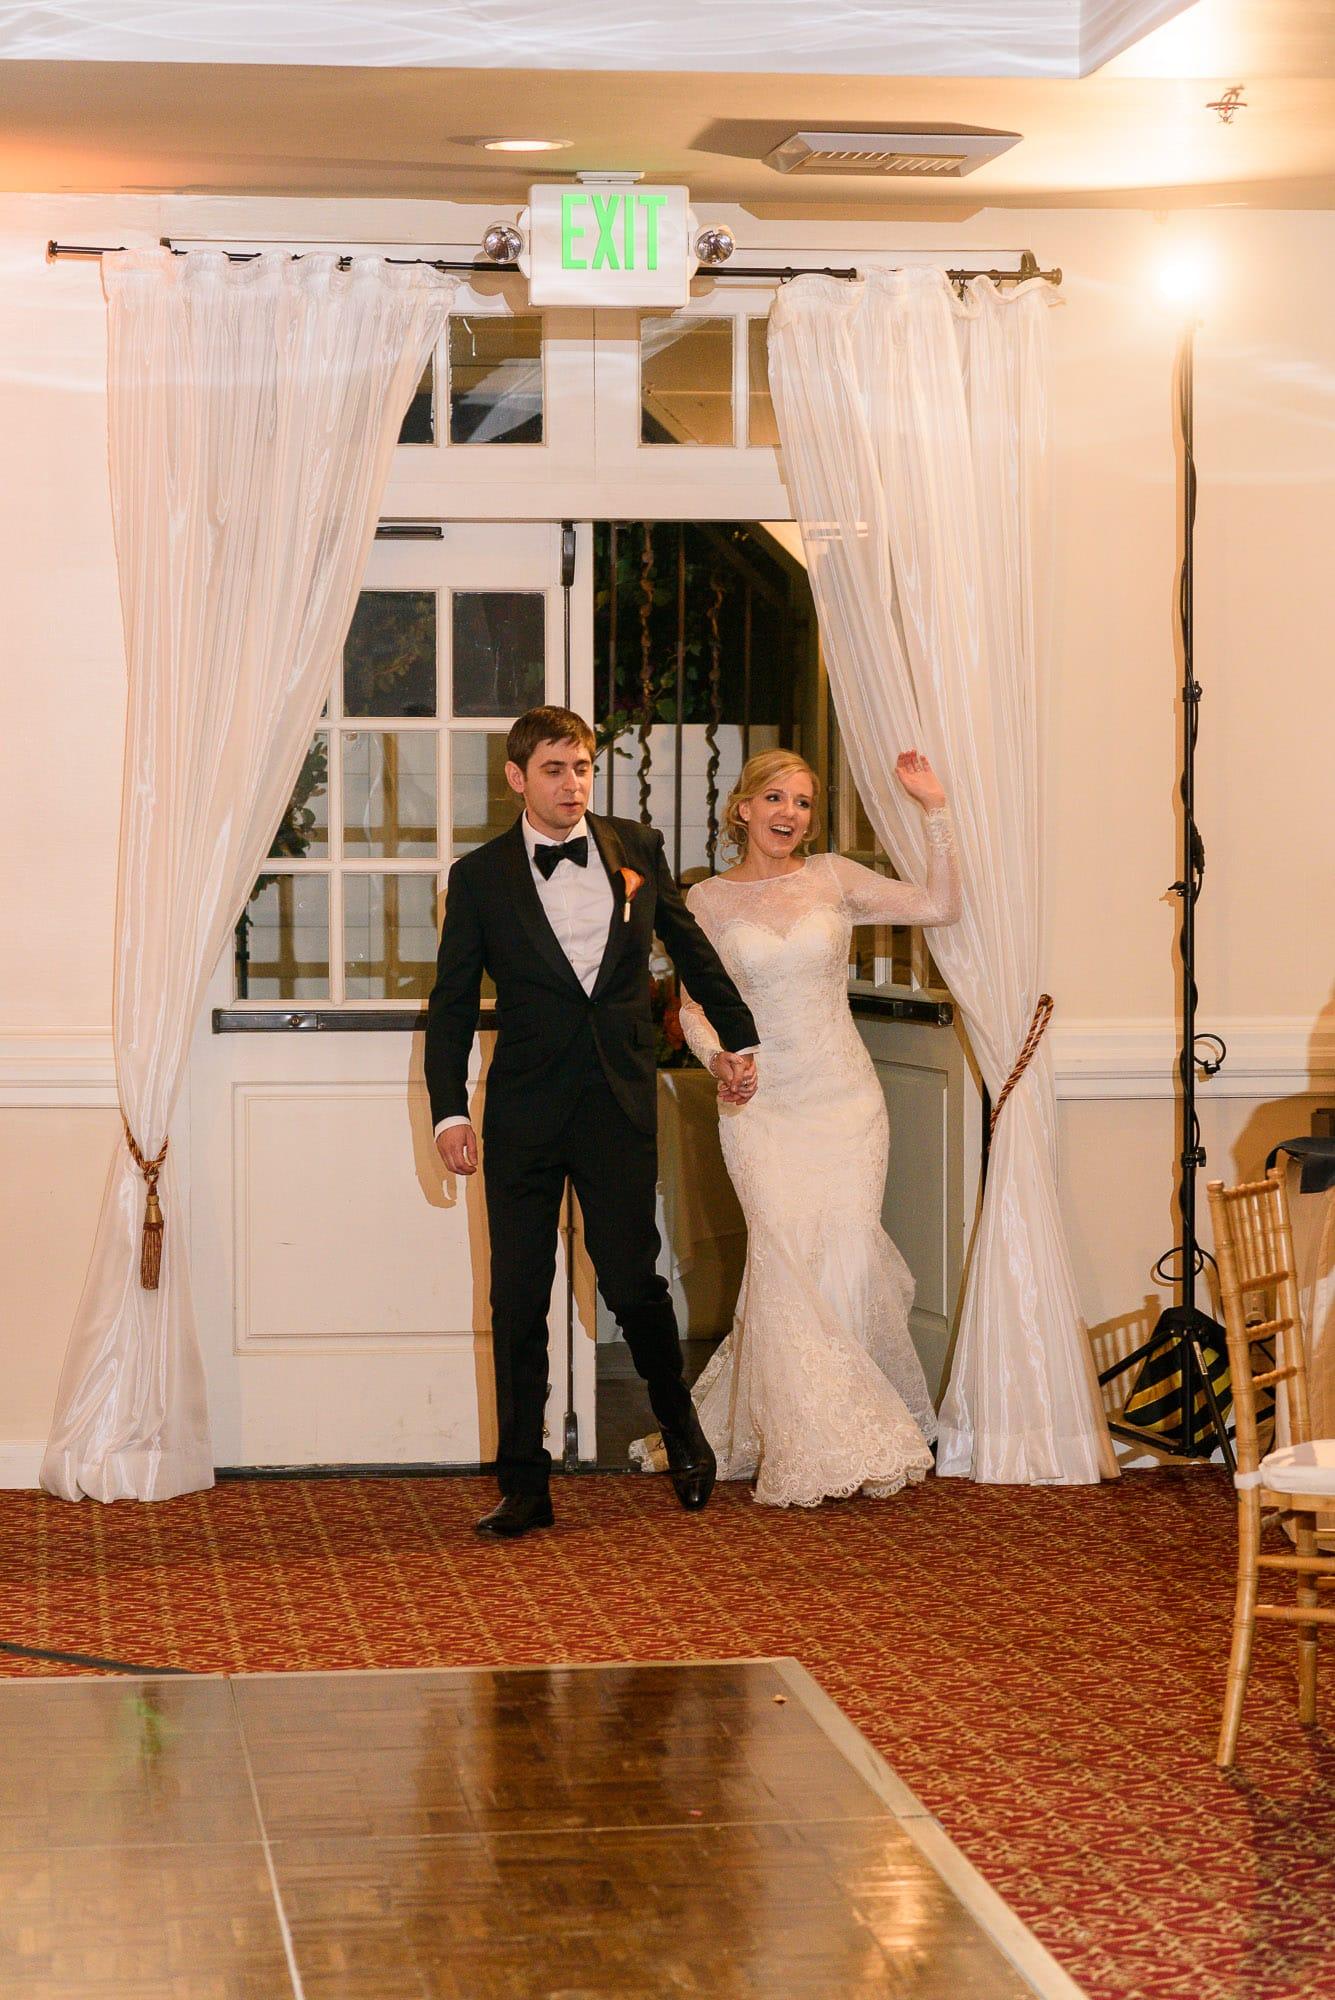 065_Alan_and_Heidi_Los_Angeles_Equestrian_Center_Wedding